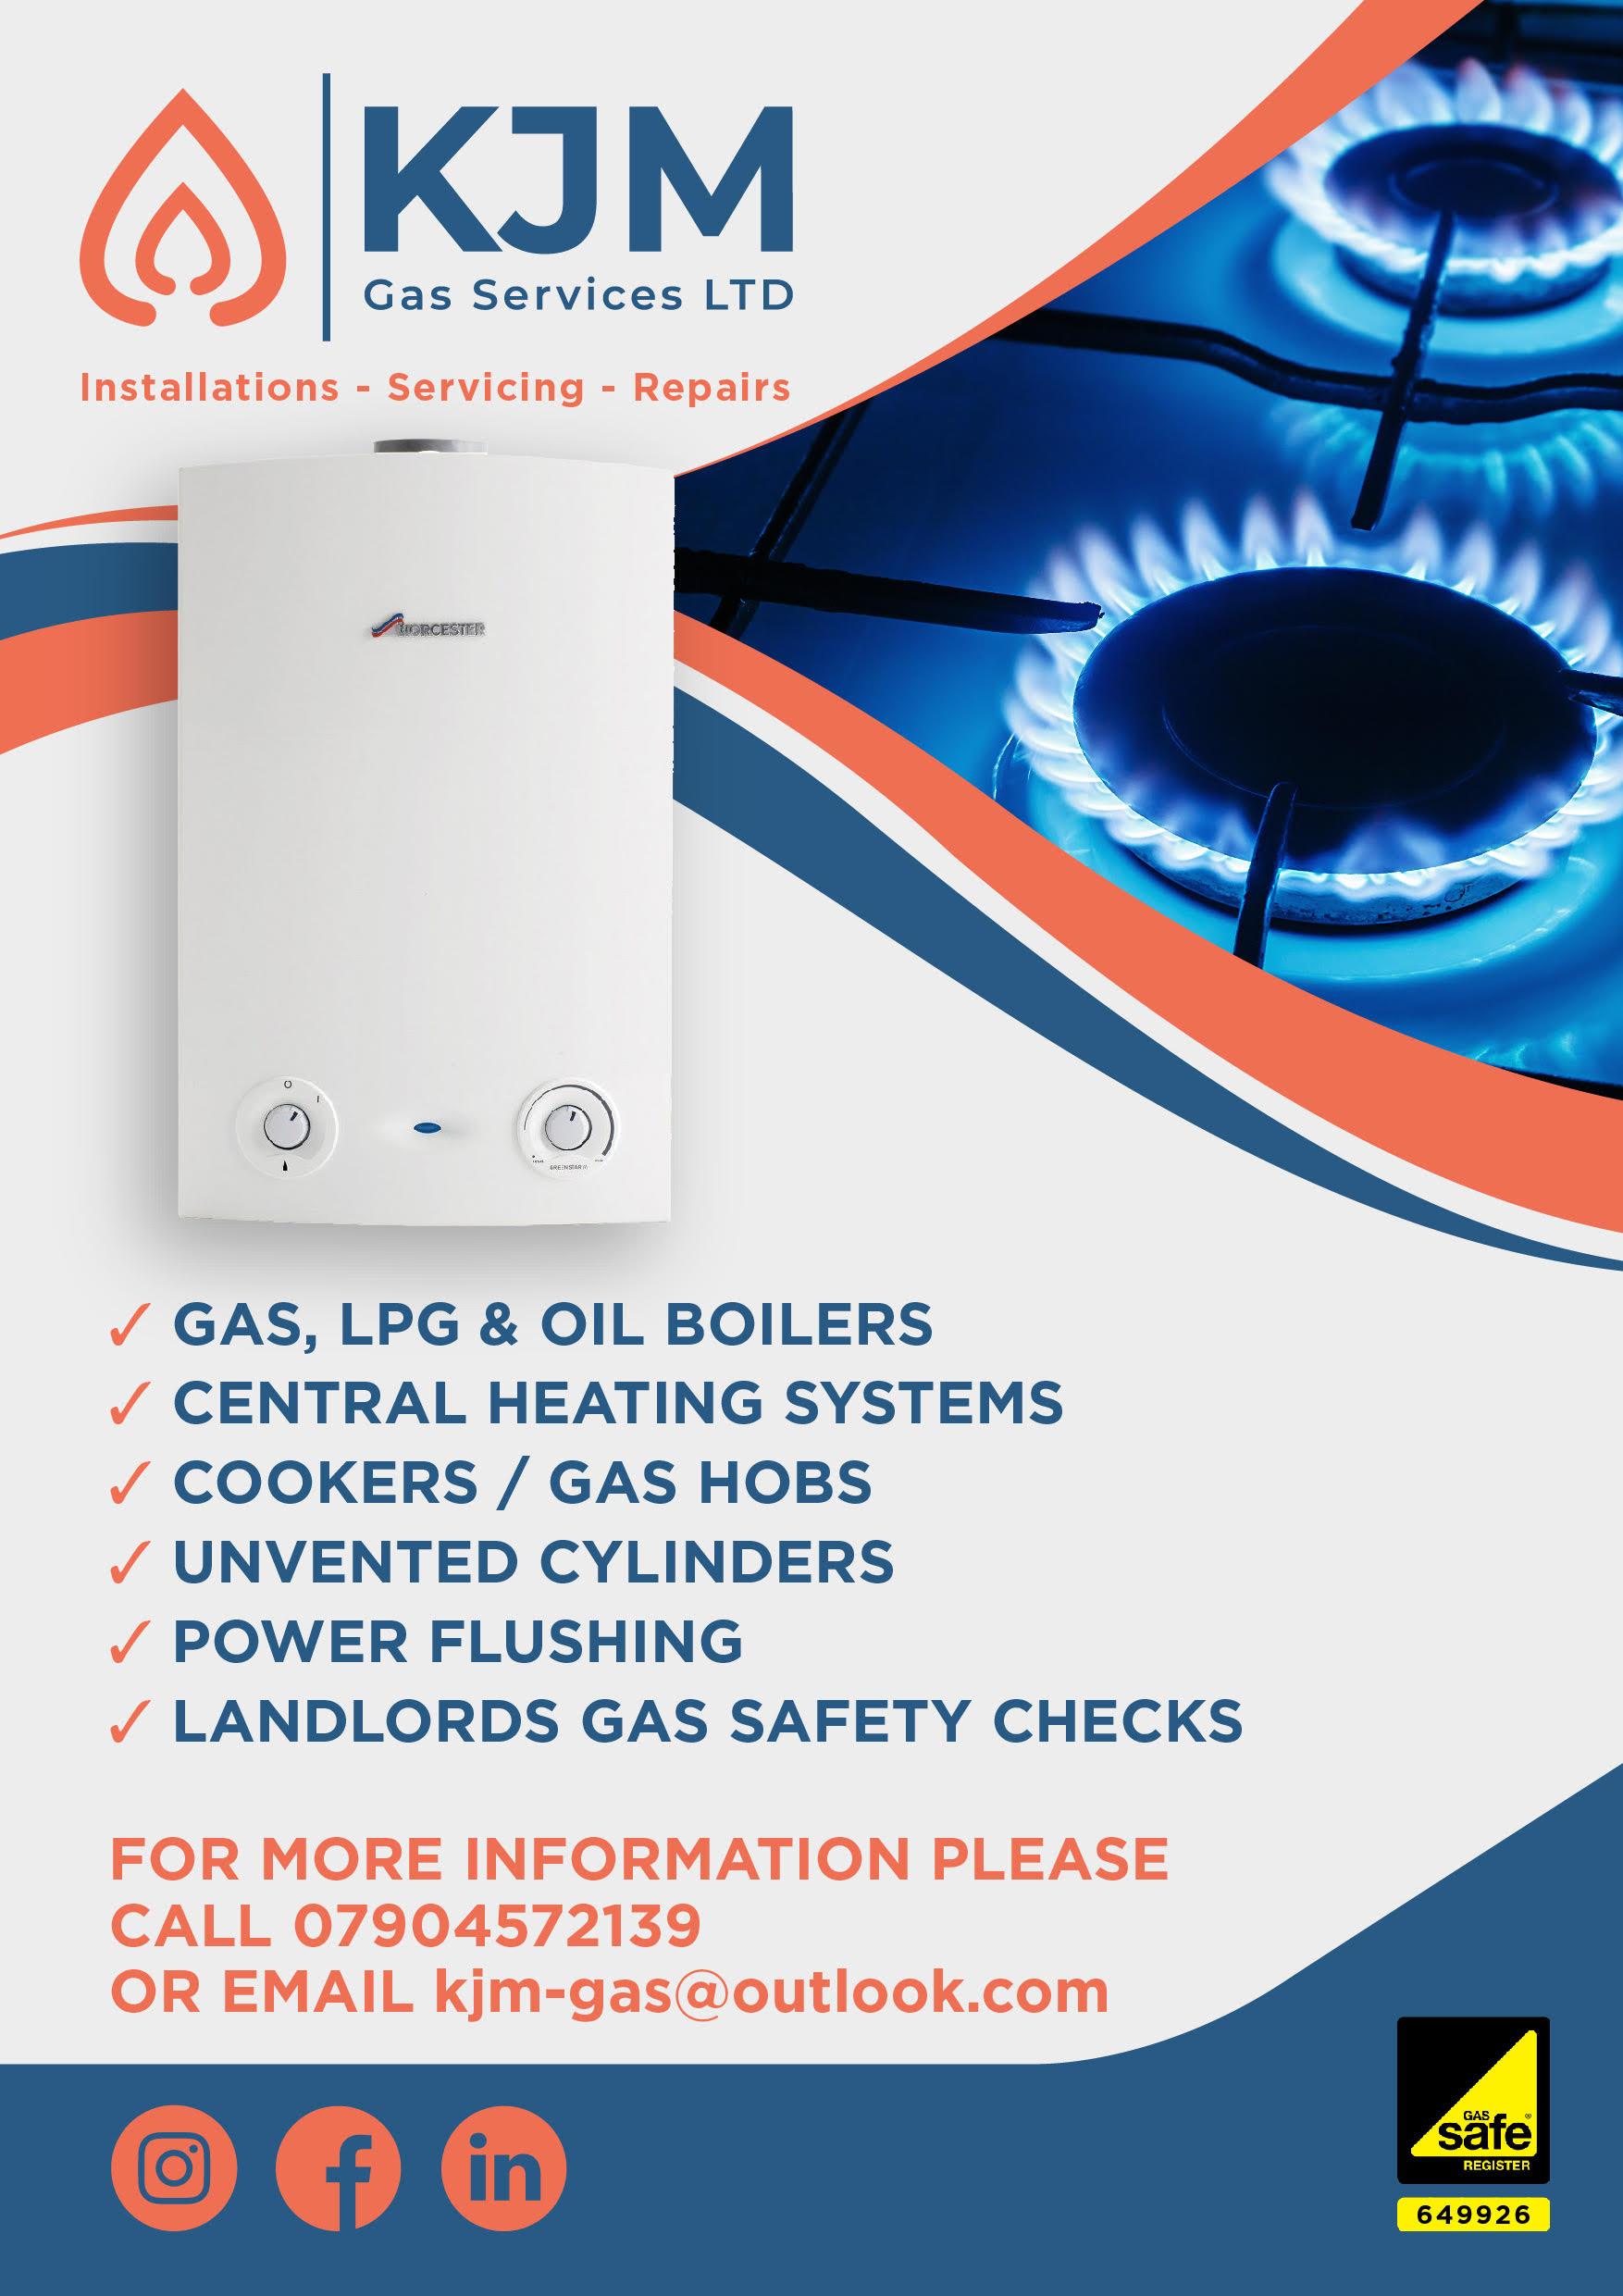 KJM Gas Services Ltd